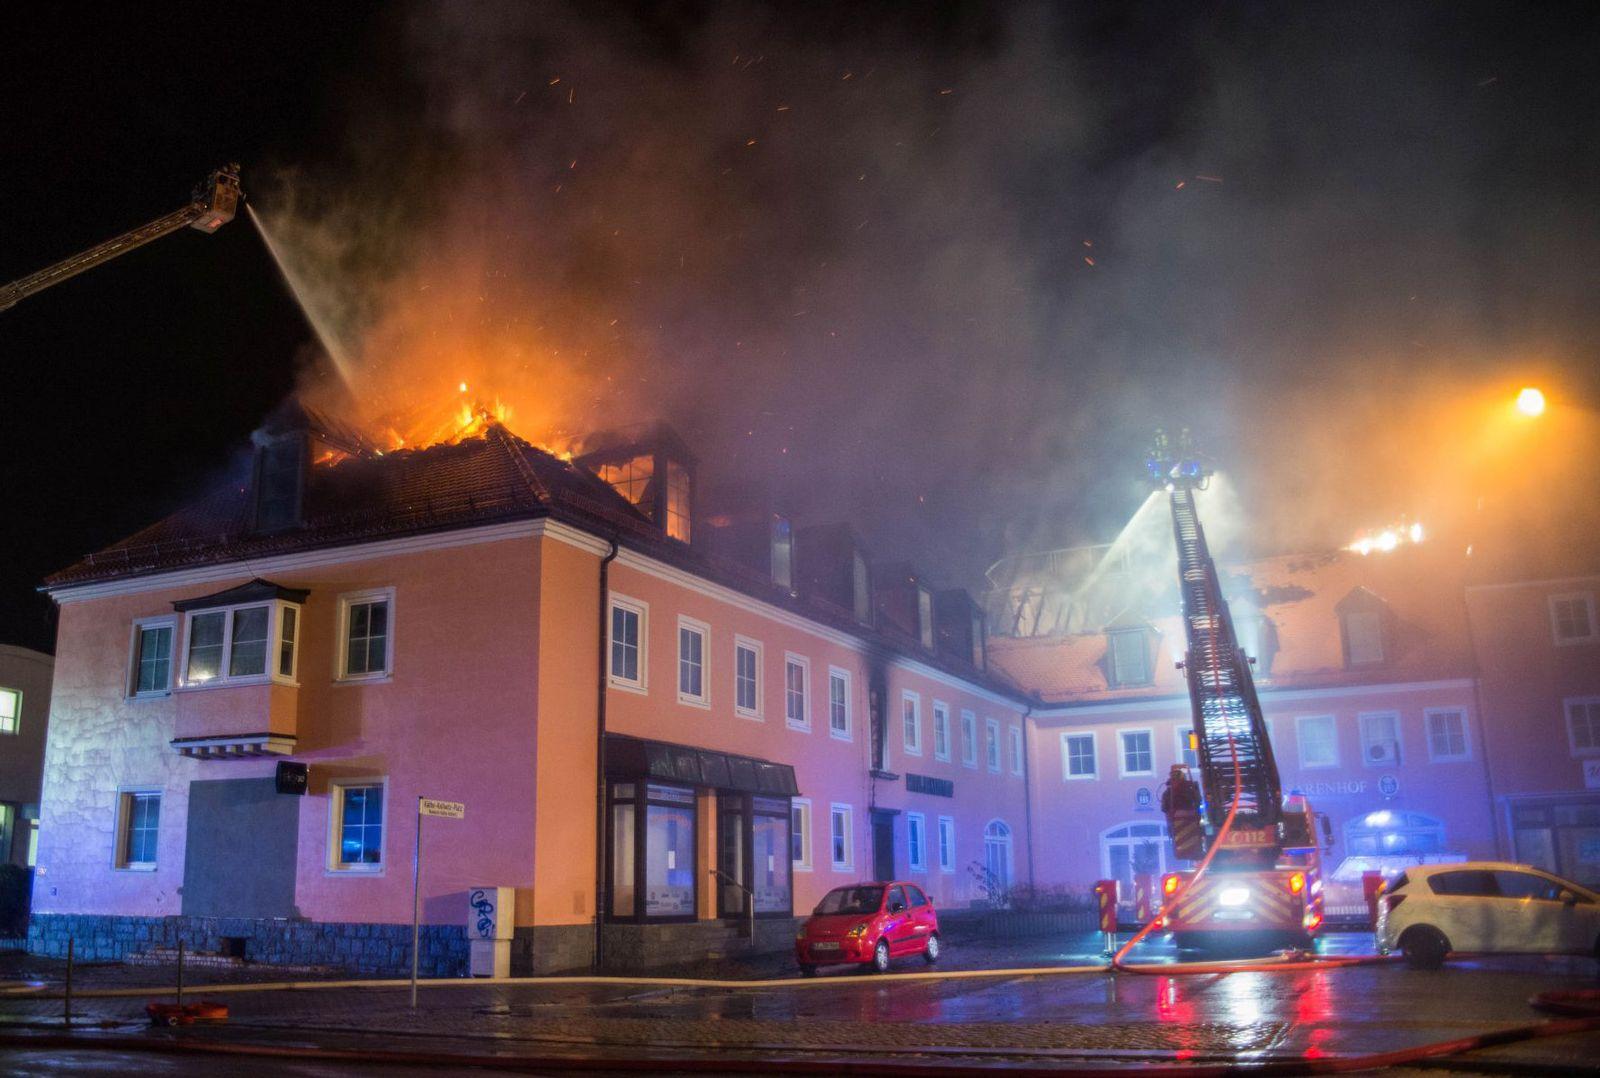 Flüchtlingsheim in Bautzen in Flammen